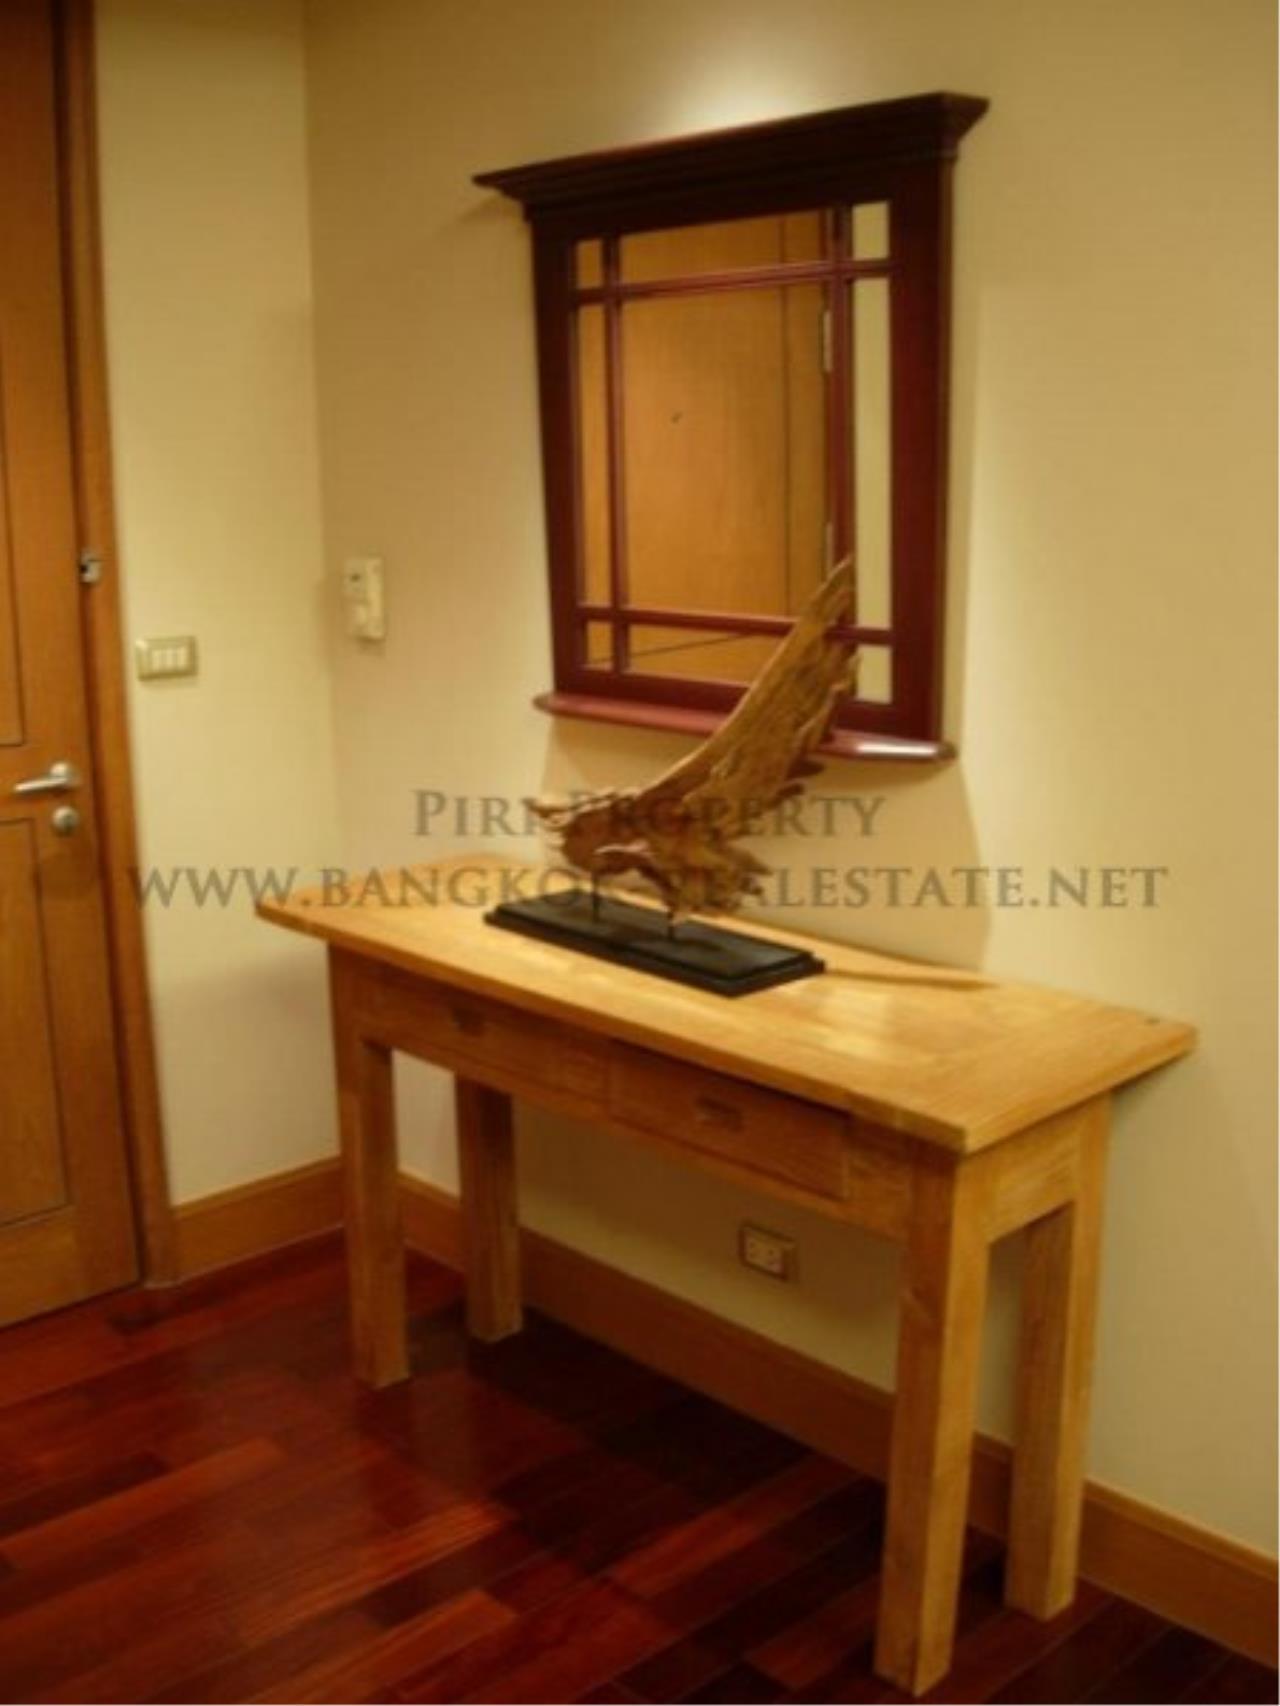 Piri Property Agency's Ascott Sathorn - Spacious 2 Bedroom Condo Unit for Rent - Sky Villa Sathorn 3